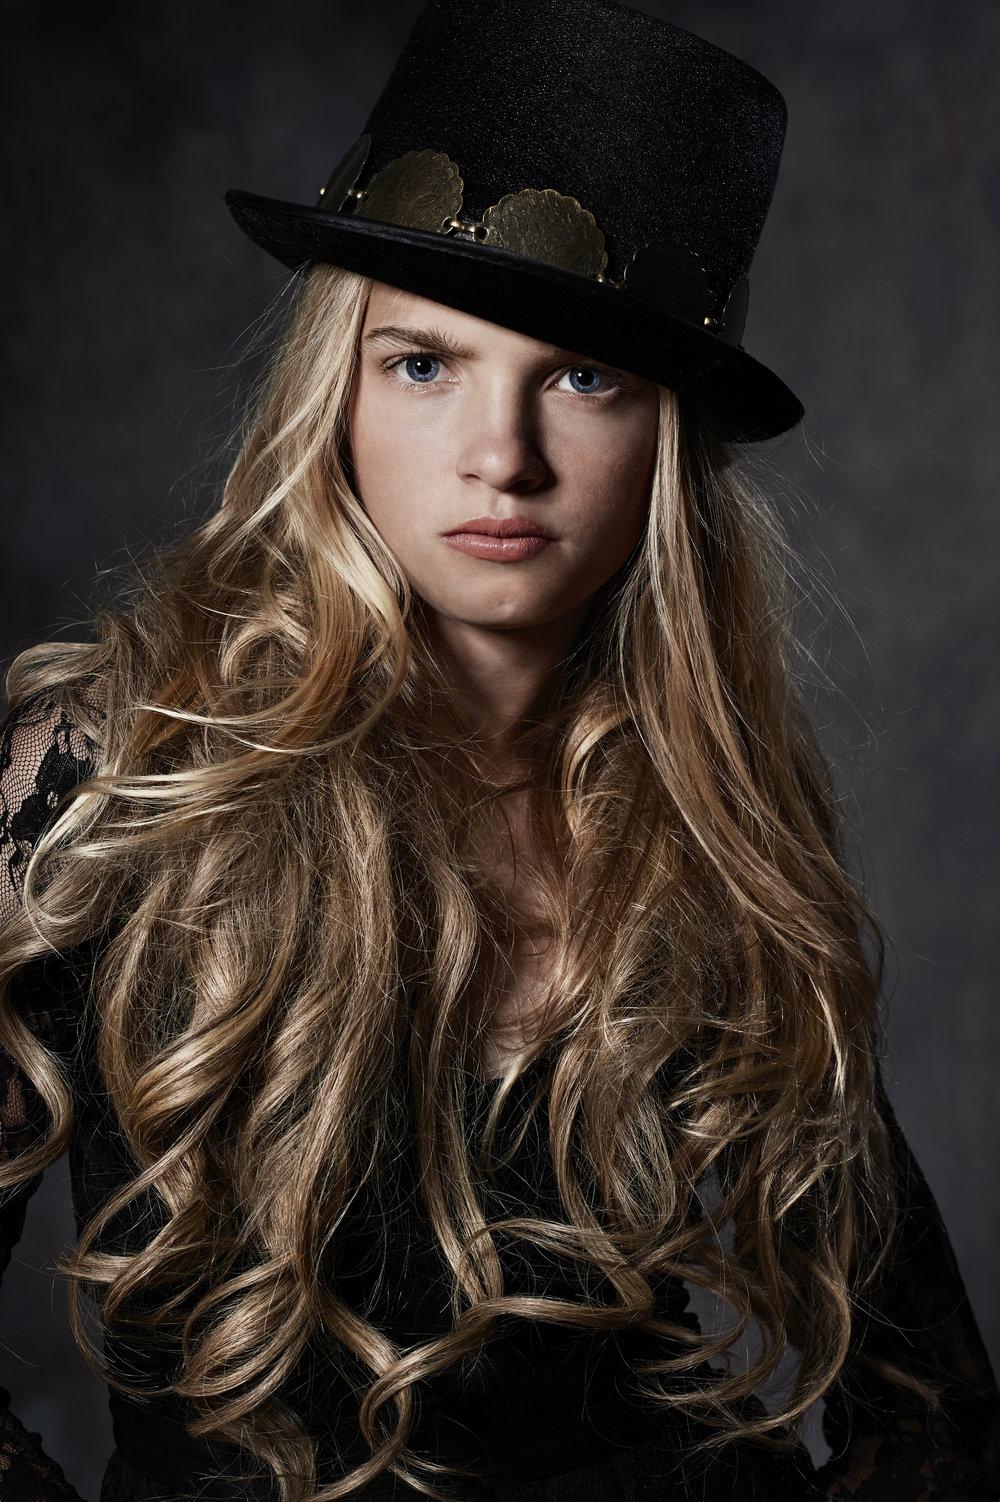 Marta-Hewson-Themed-portrait-hair-extensions-tophat.jpg